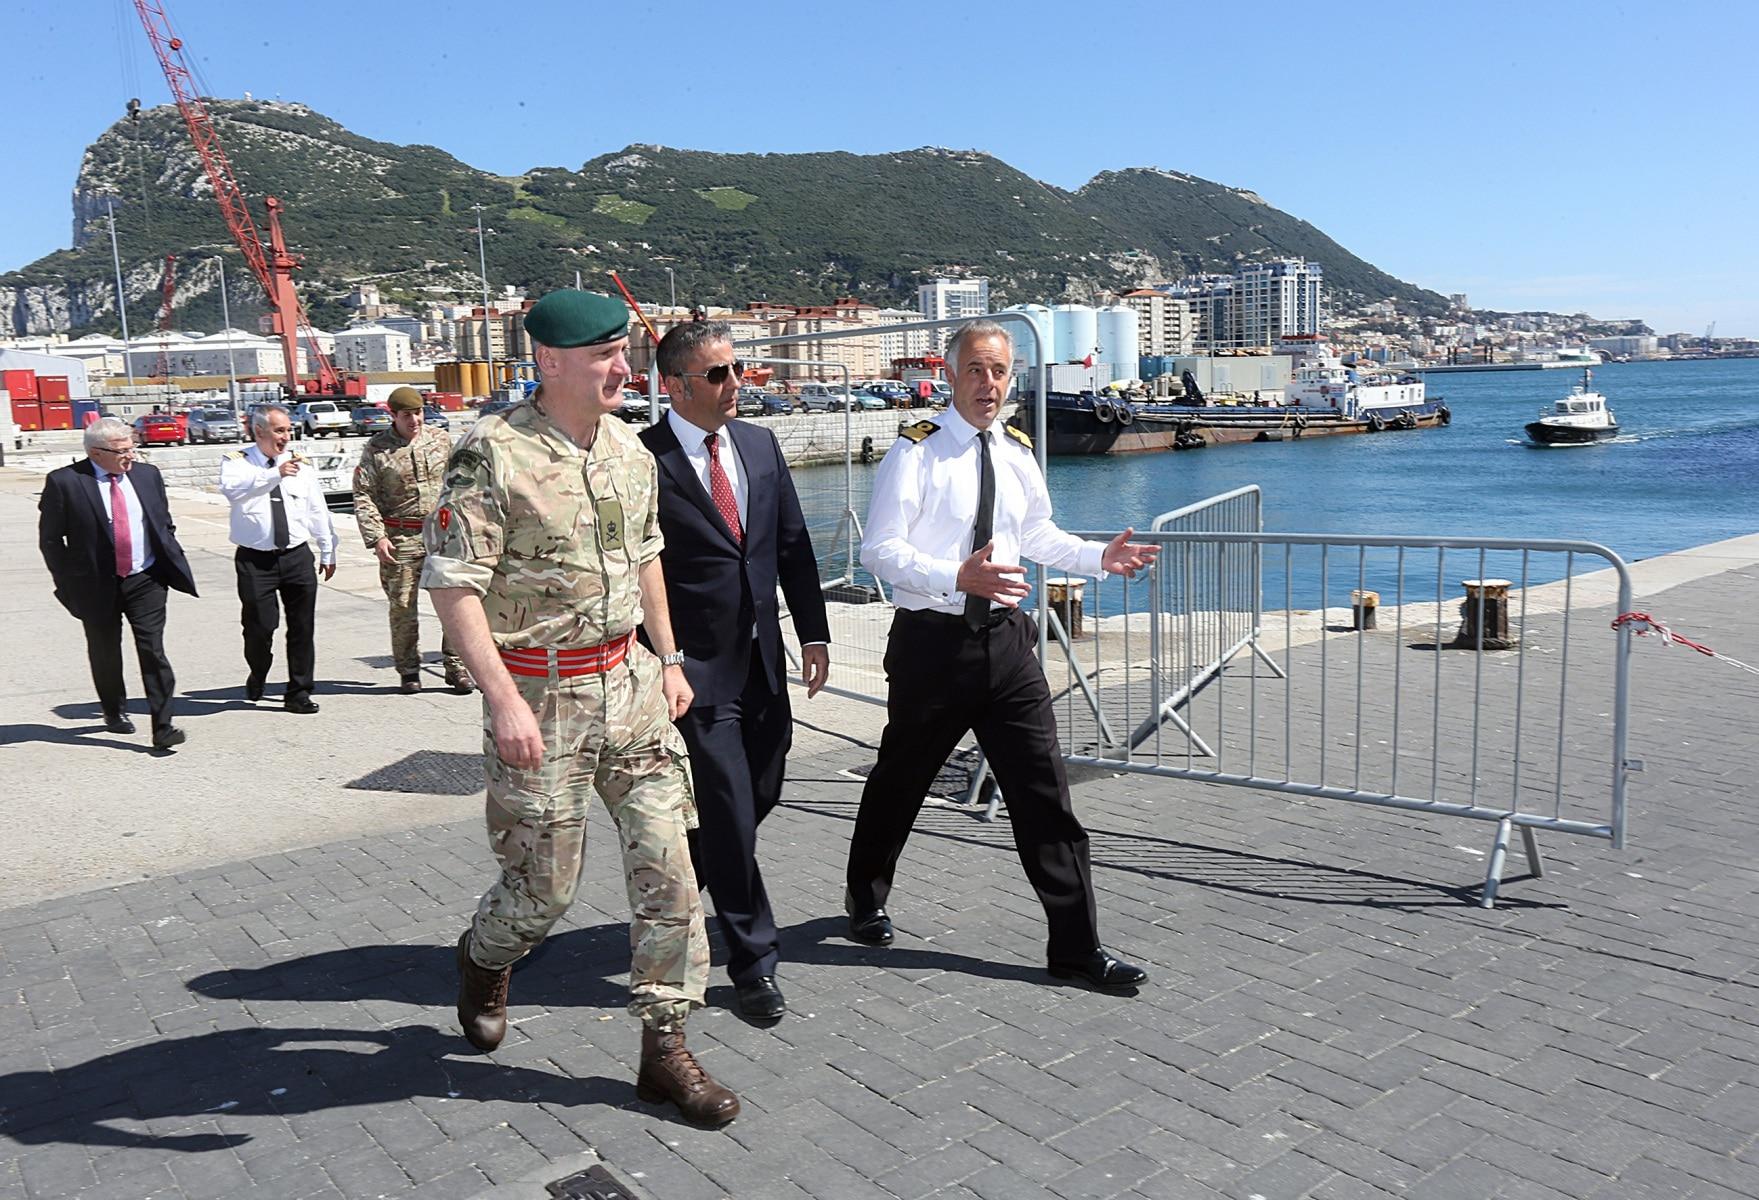 visita-oficial-del-gobernador-al-puerto-de-gibraltar_26128564476_o